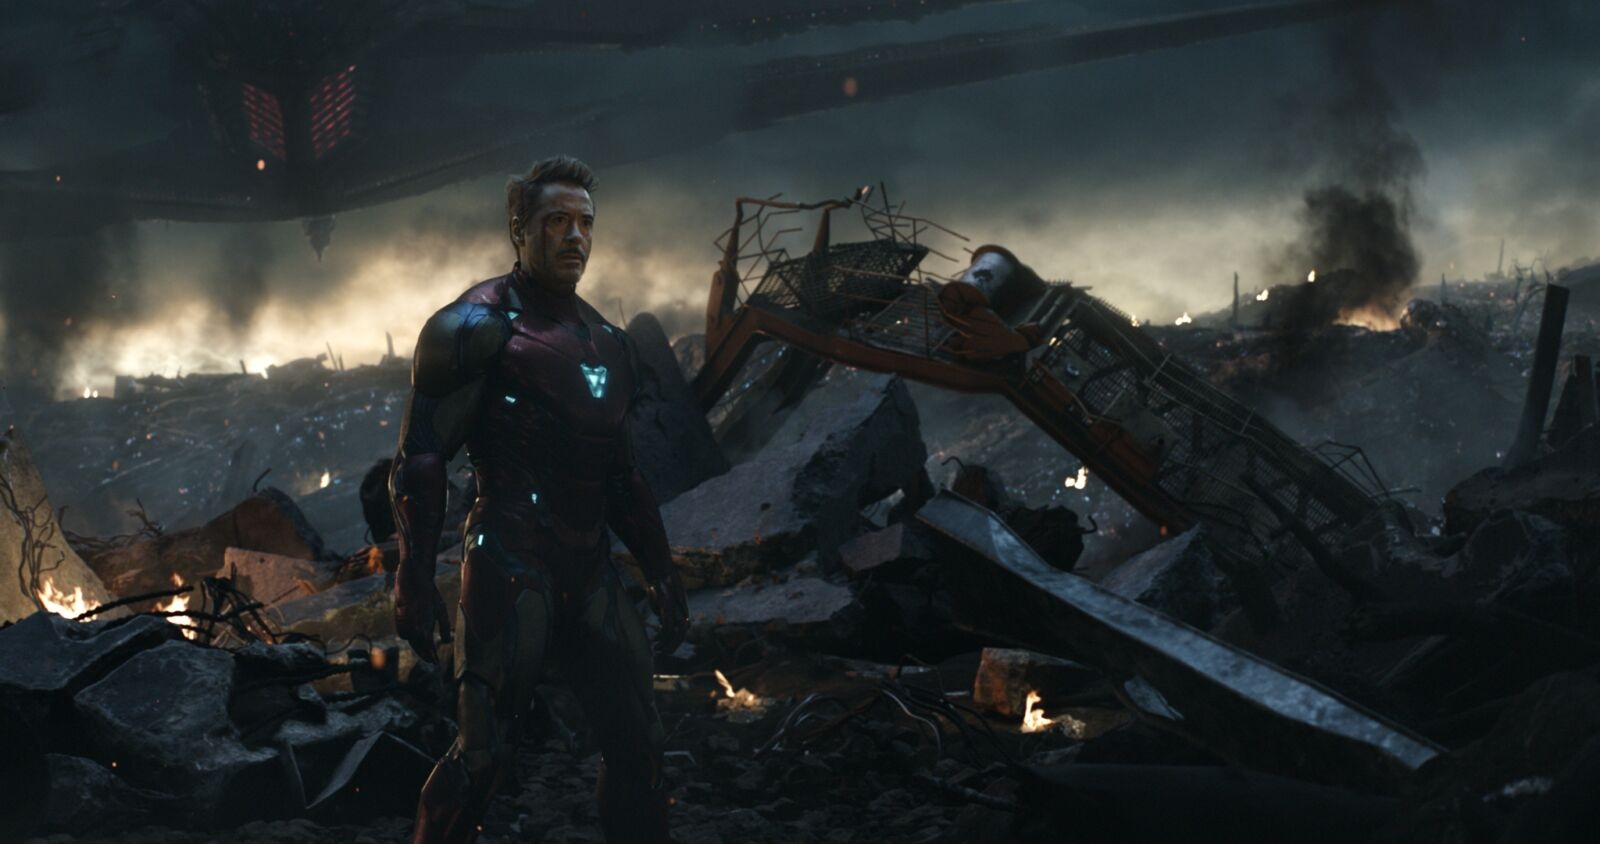 Endgame set clip shows how Iron Man, Doctor Strange's reunion came together